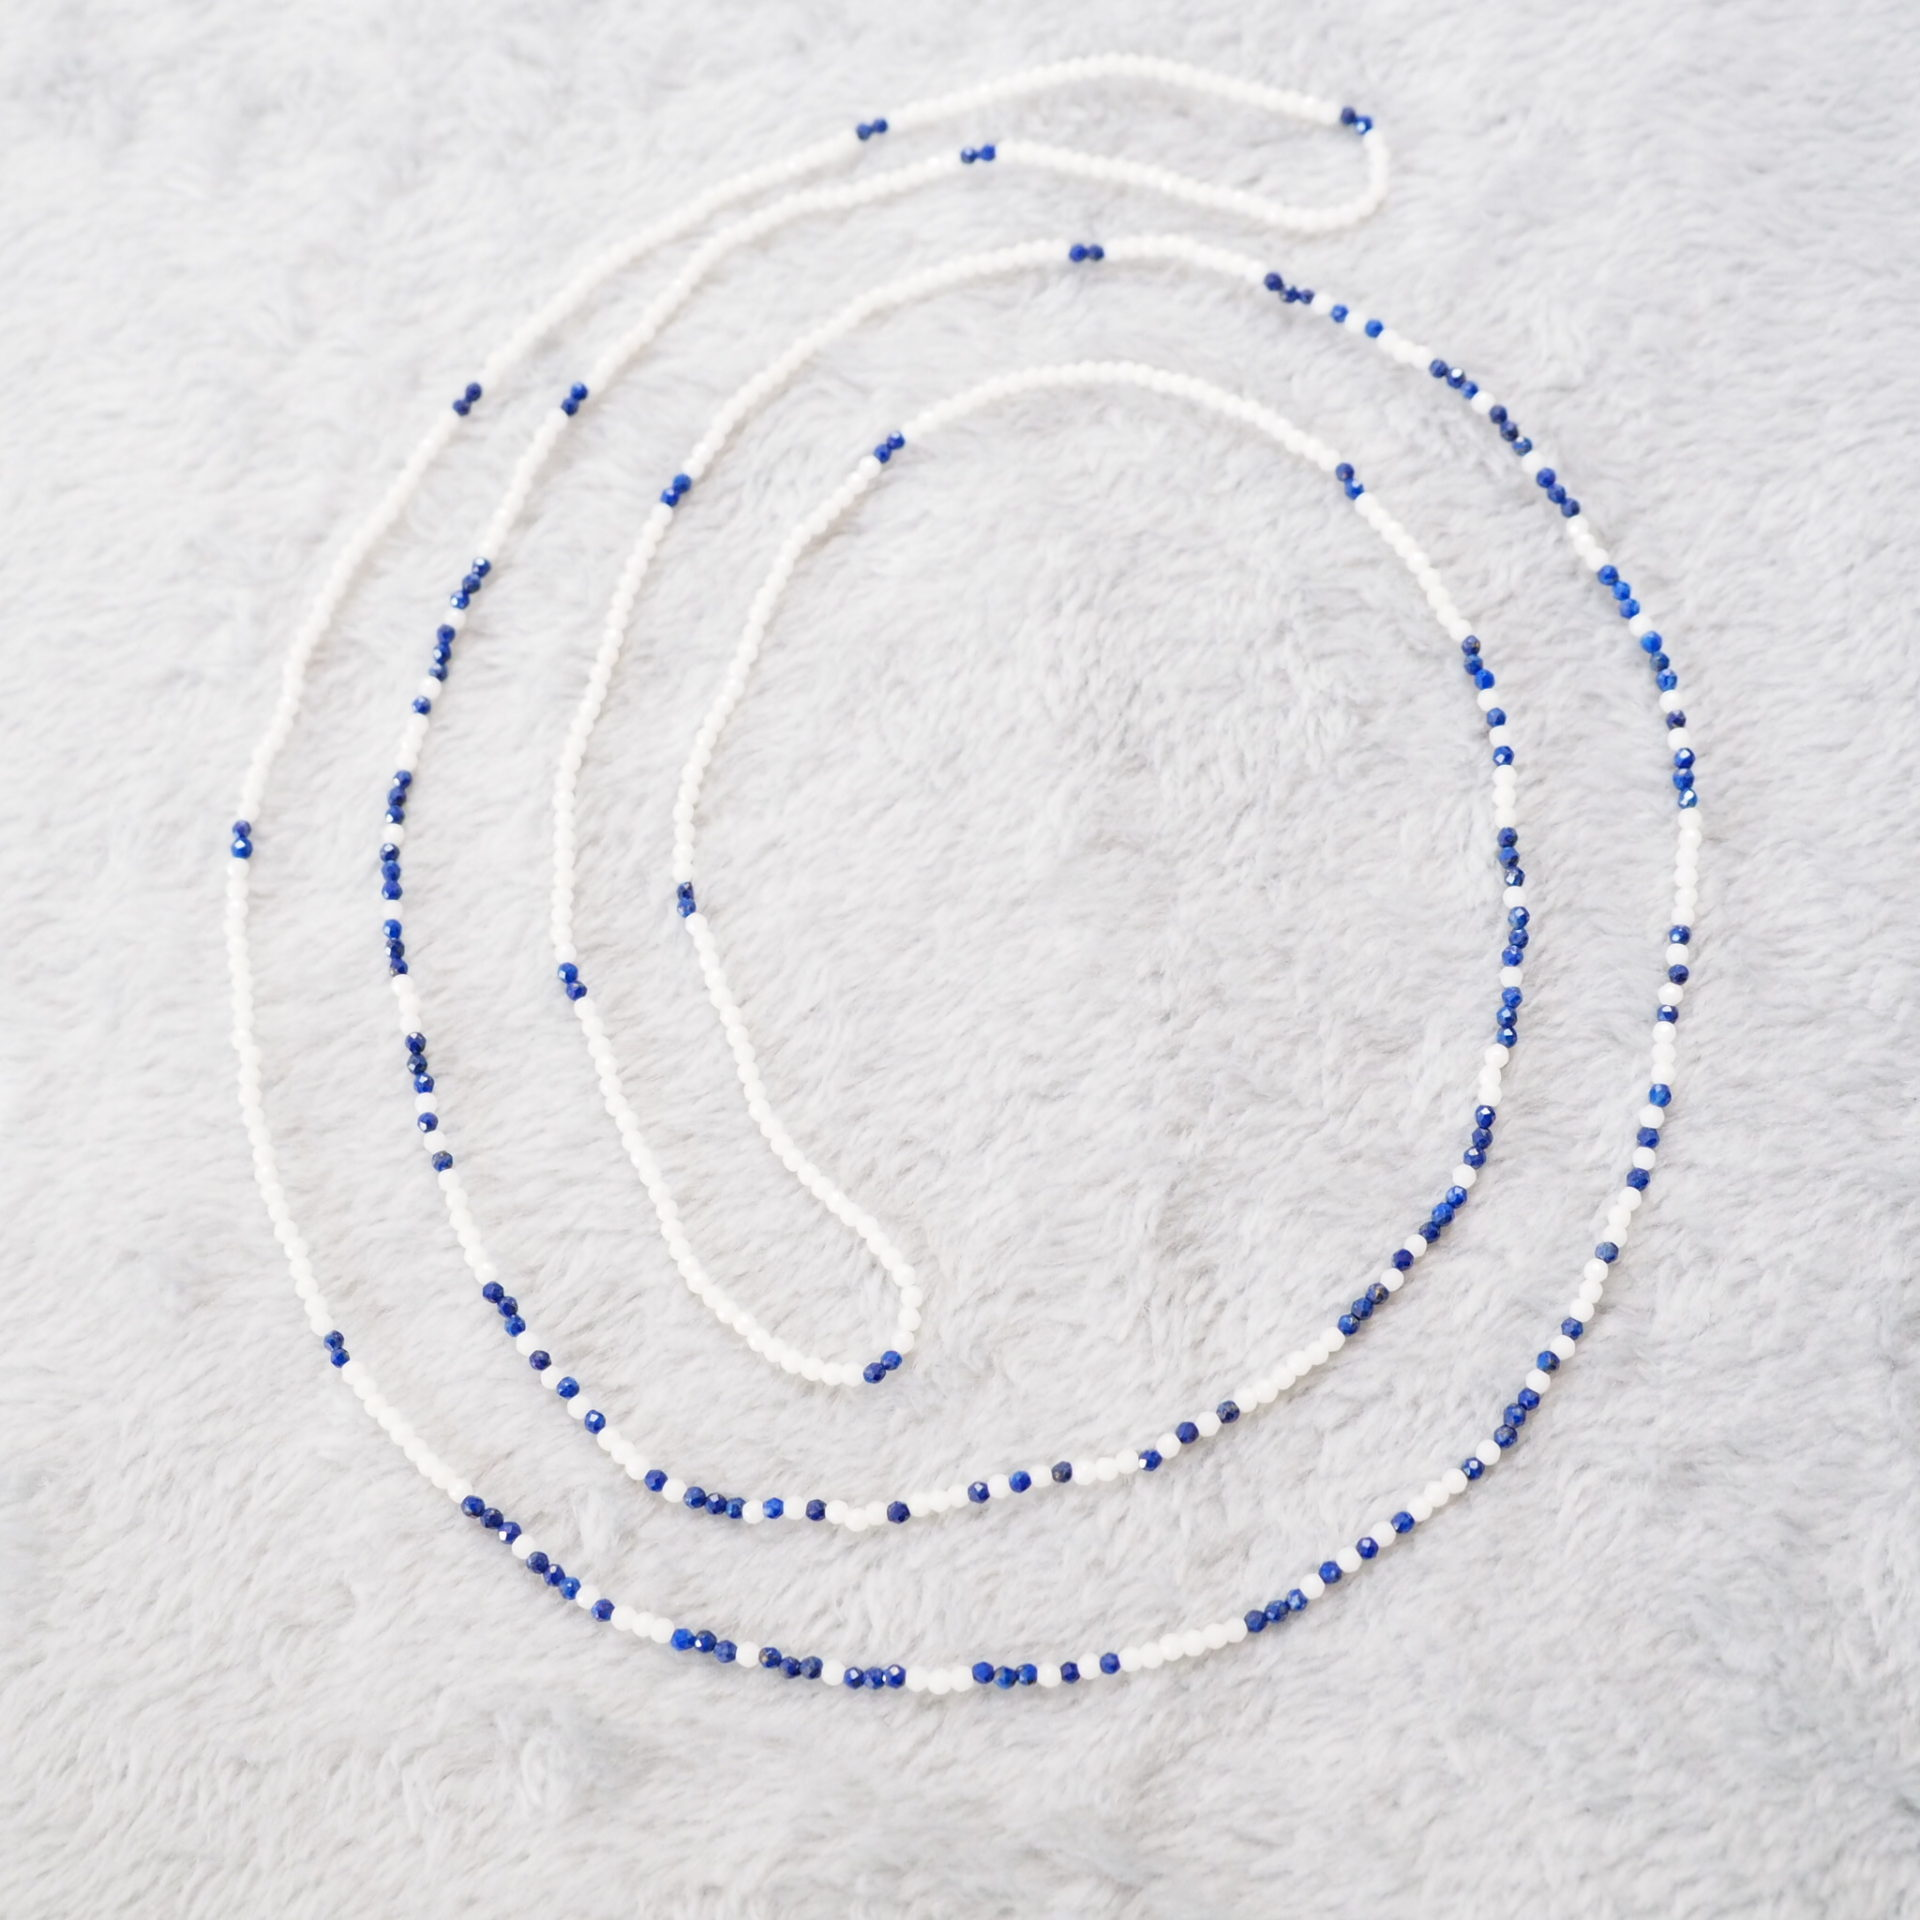 Semi-order-made-Morse-Code-Message-Necklace-Lapis-Lazuli-White-Coral-120cm